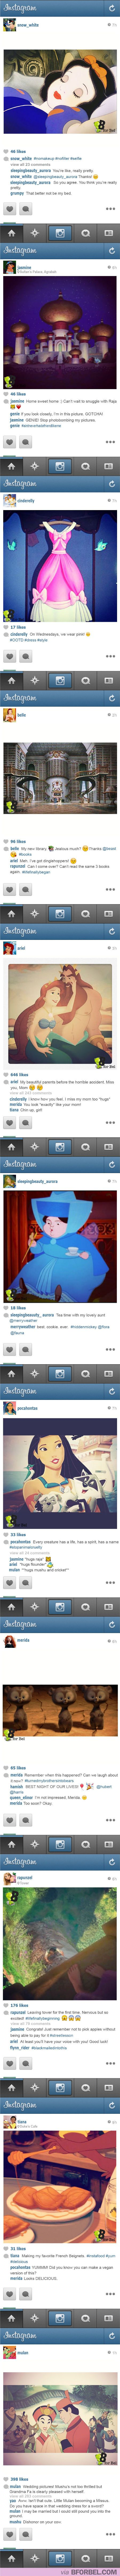 If Disney Princesses had Instagram... I'm dying.